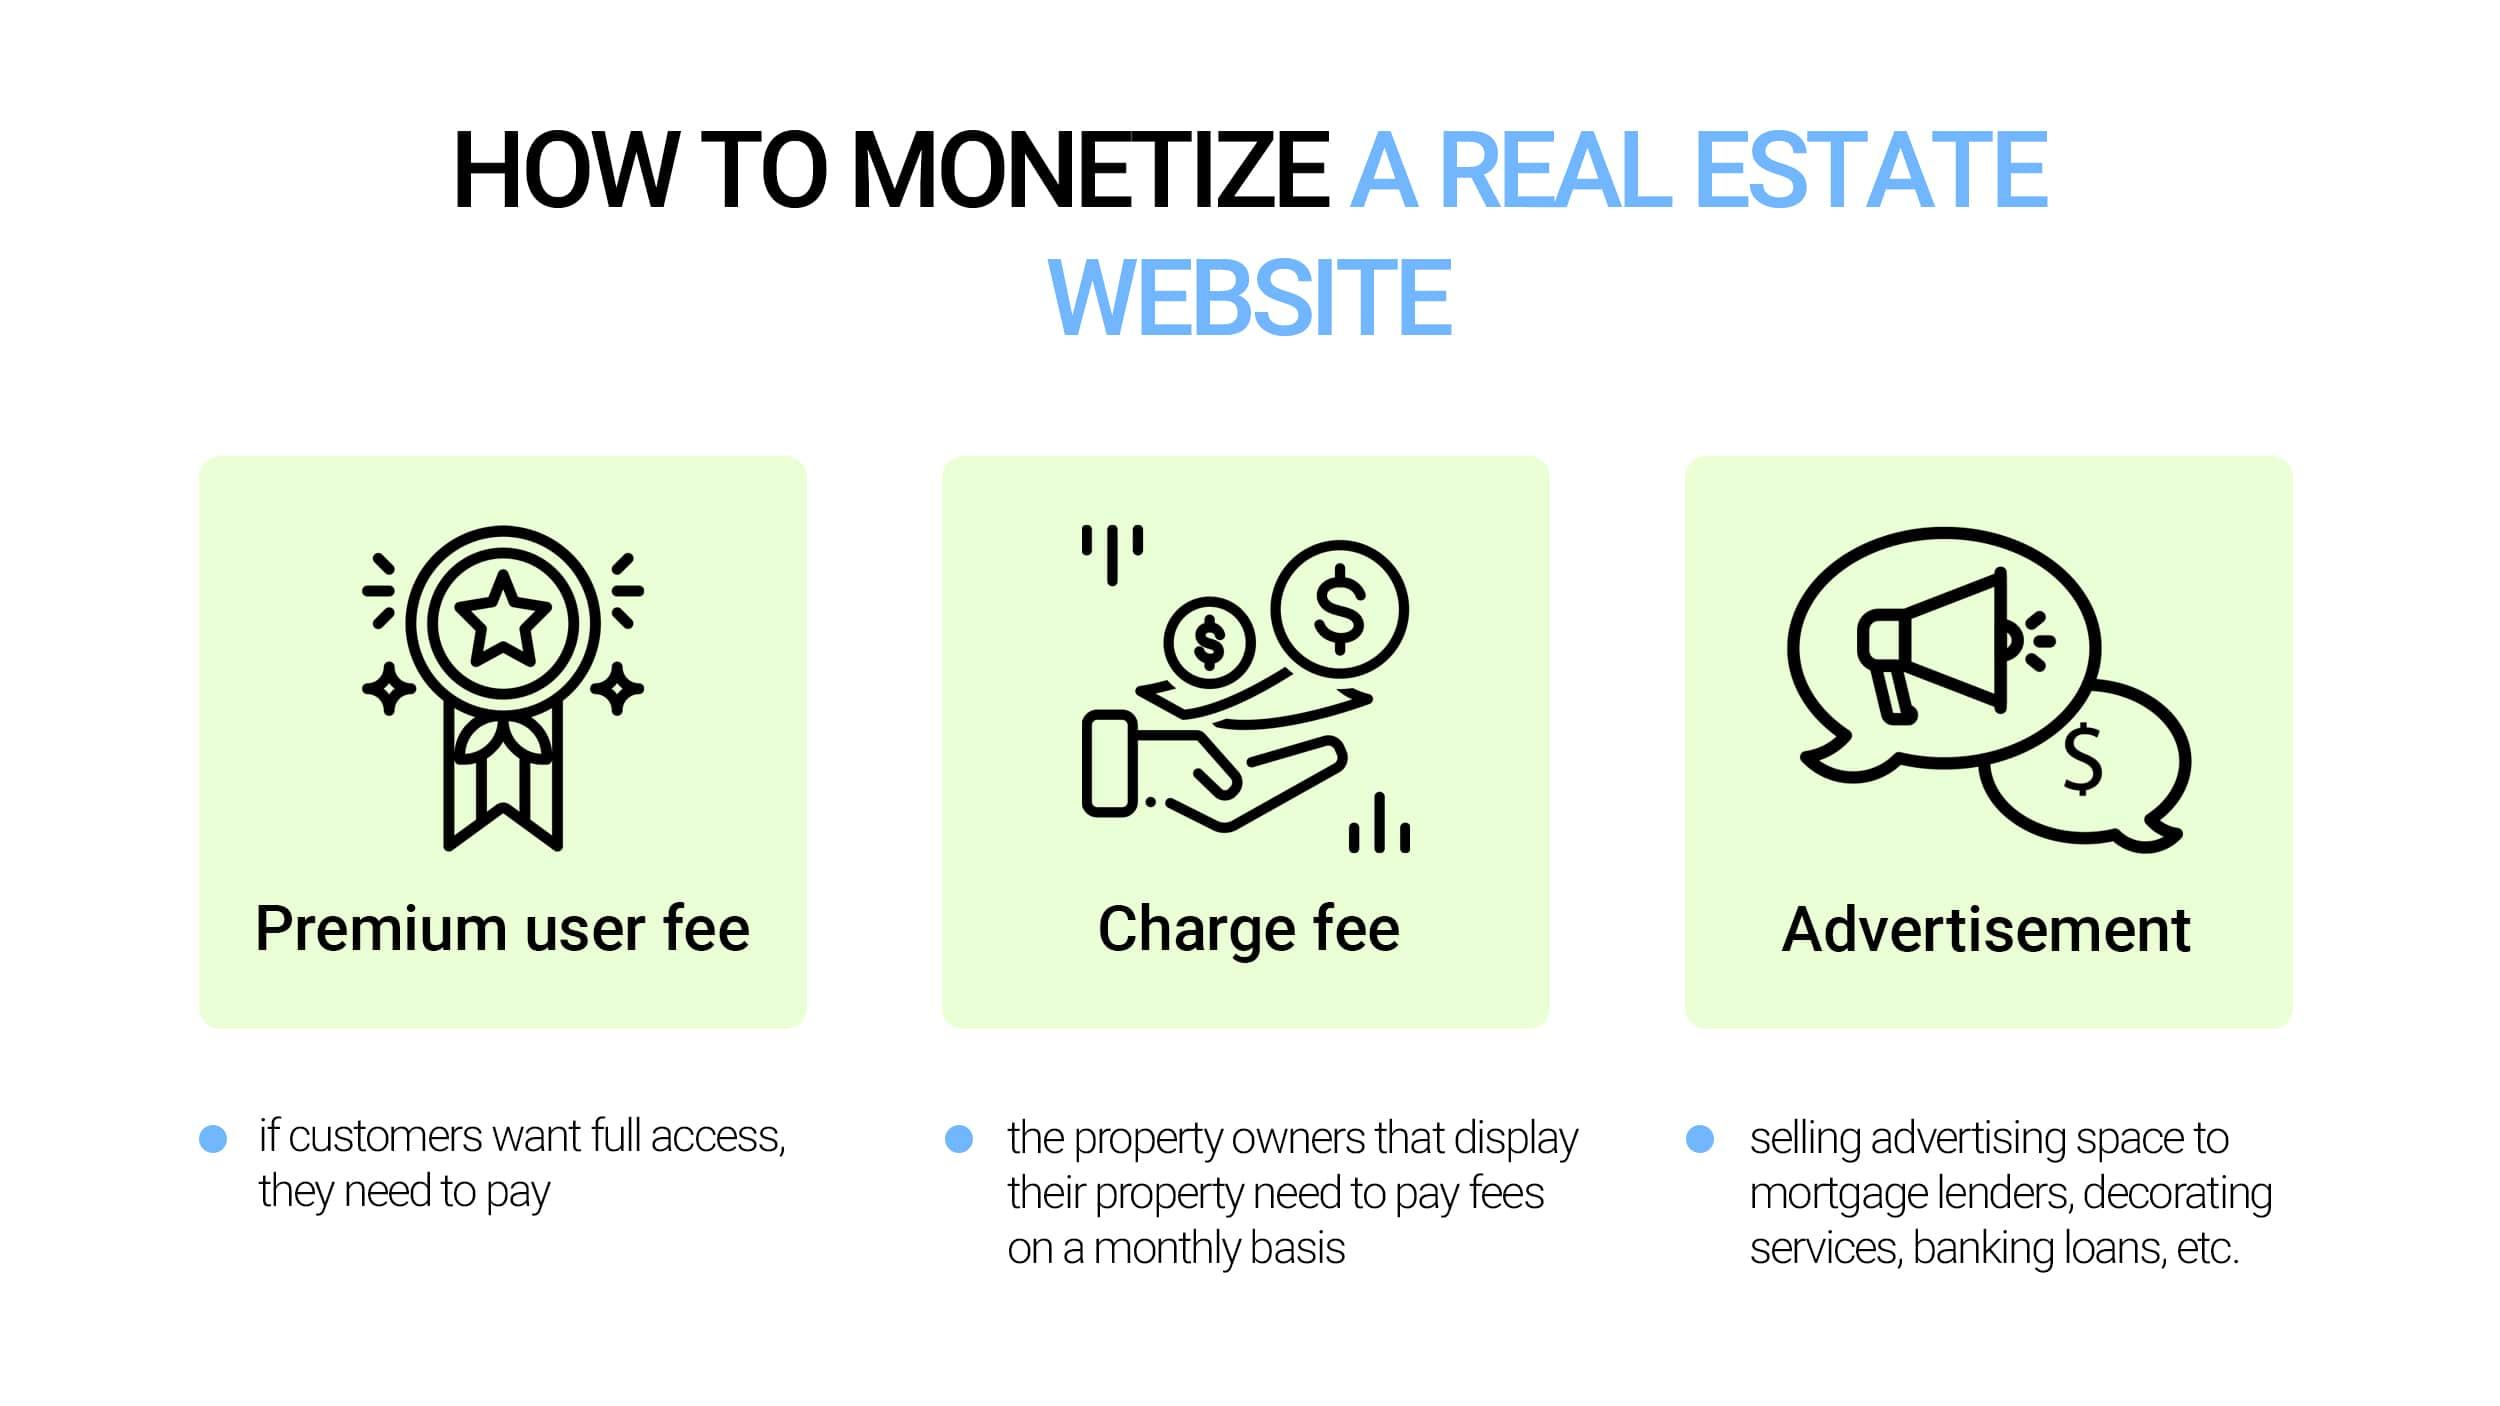 Monetization strategies for real estate websites